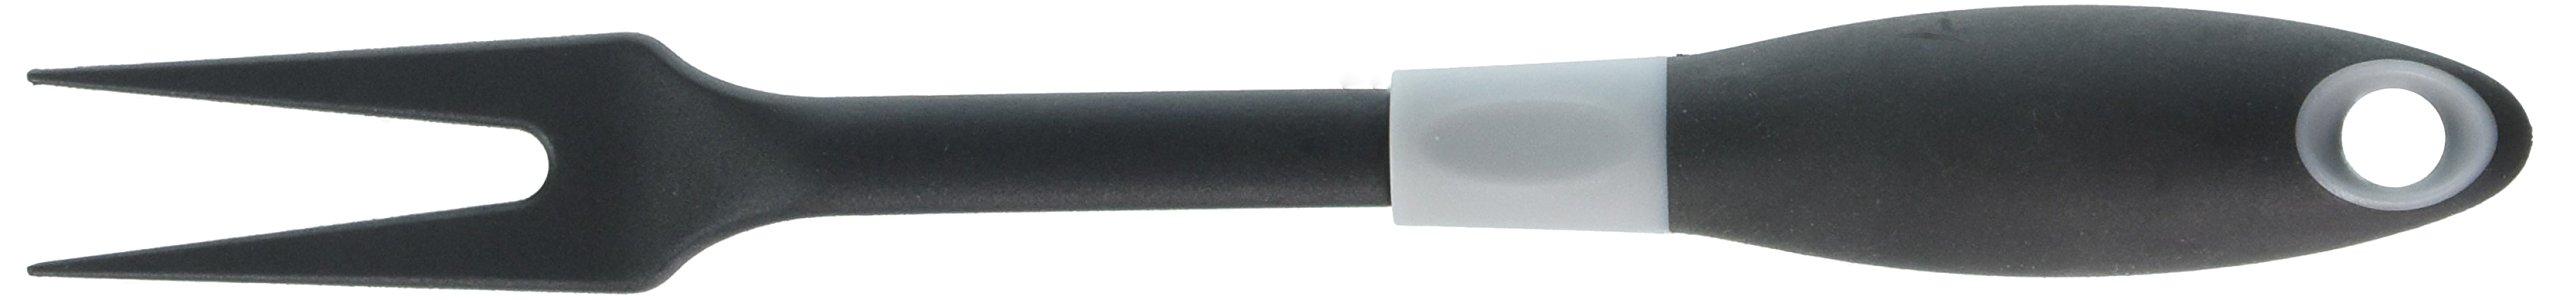 Proctor Silex Mini Nylon Fork - Black 08707